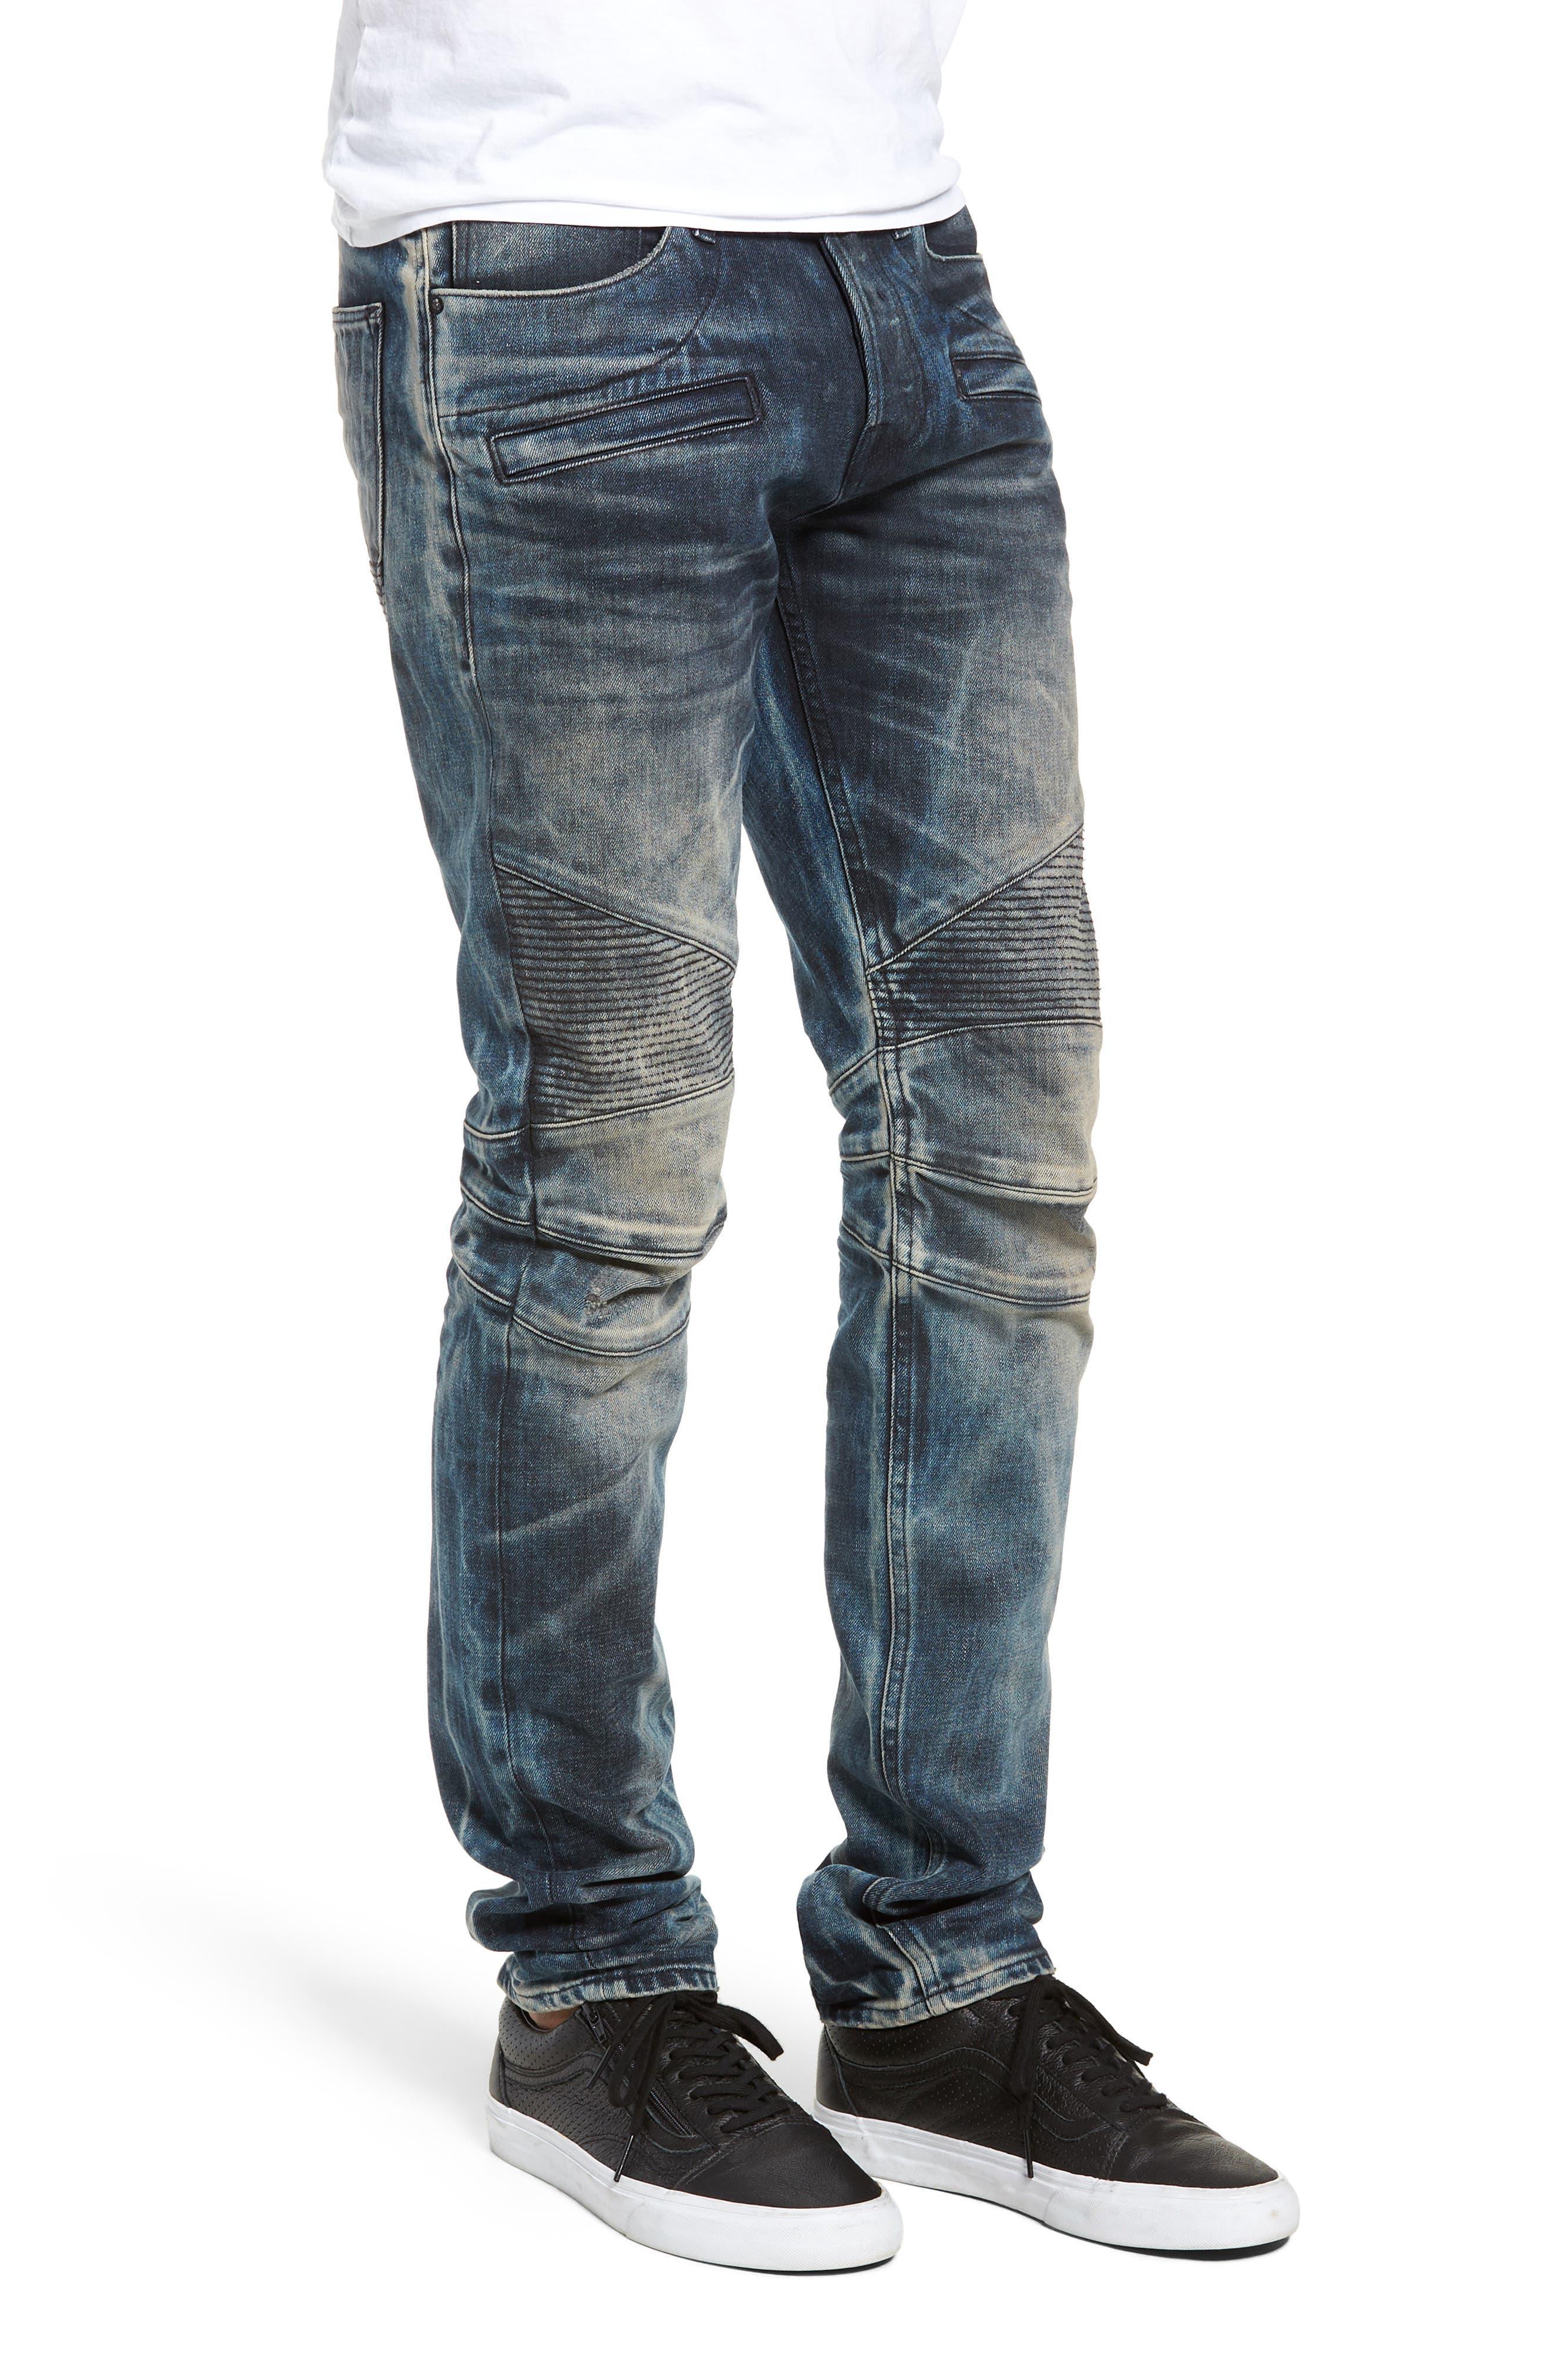 Blinder Biker Skinny Fit Jeans,                             Alternate thumbnail 3, color,                             MARTINO